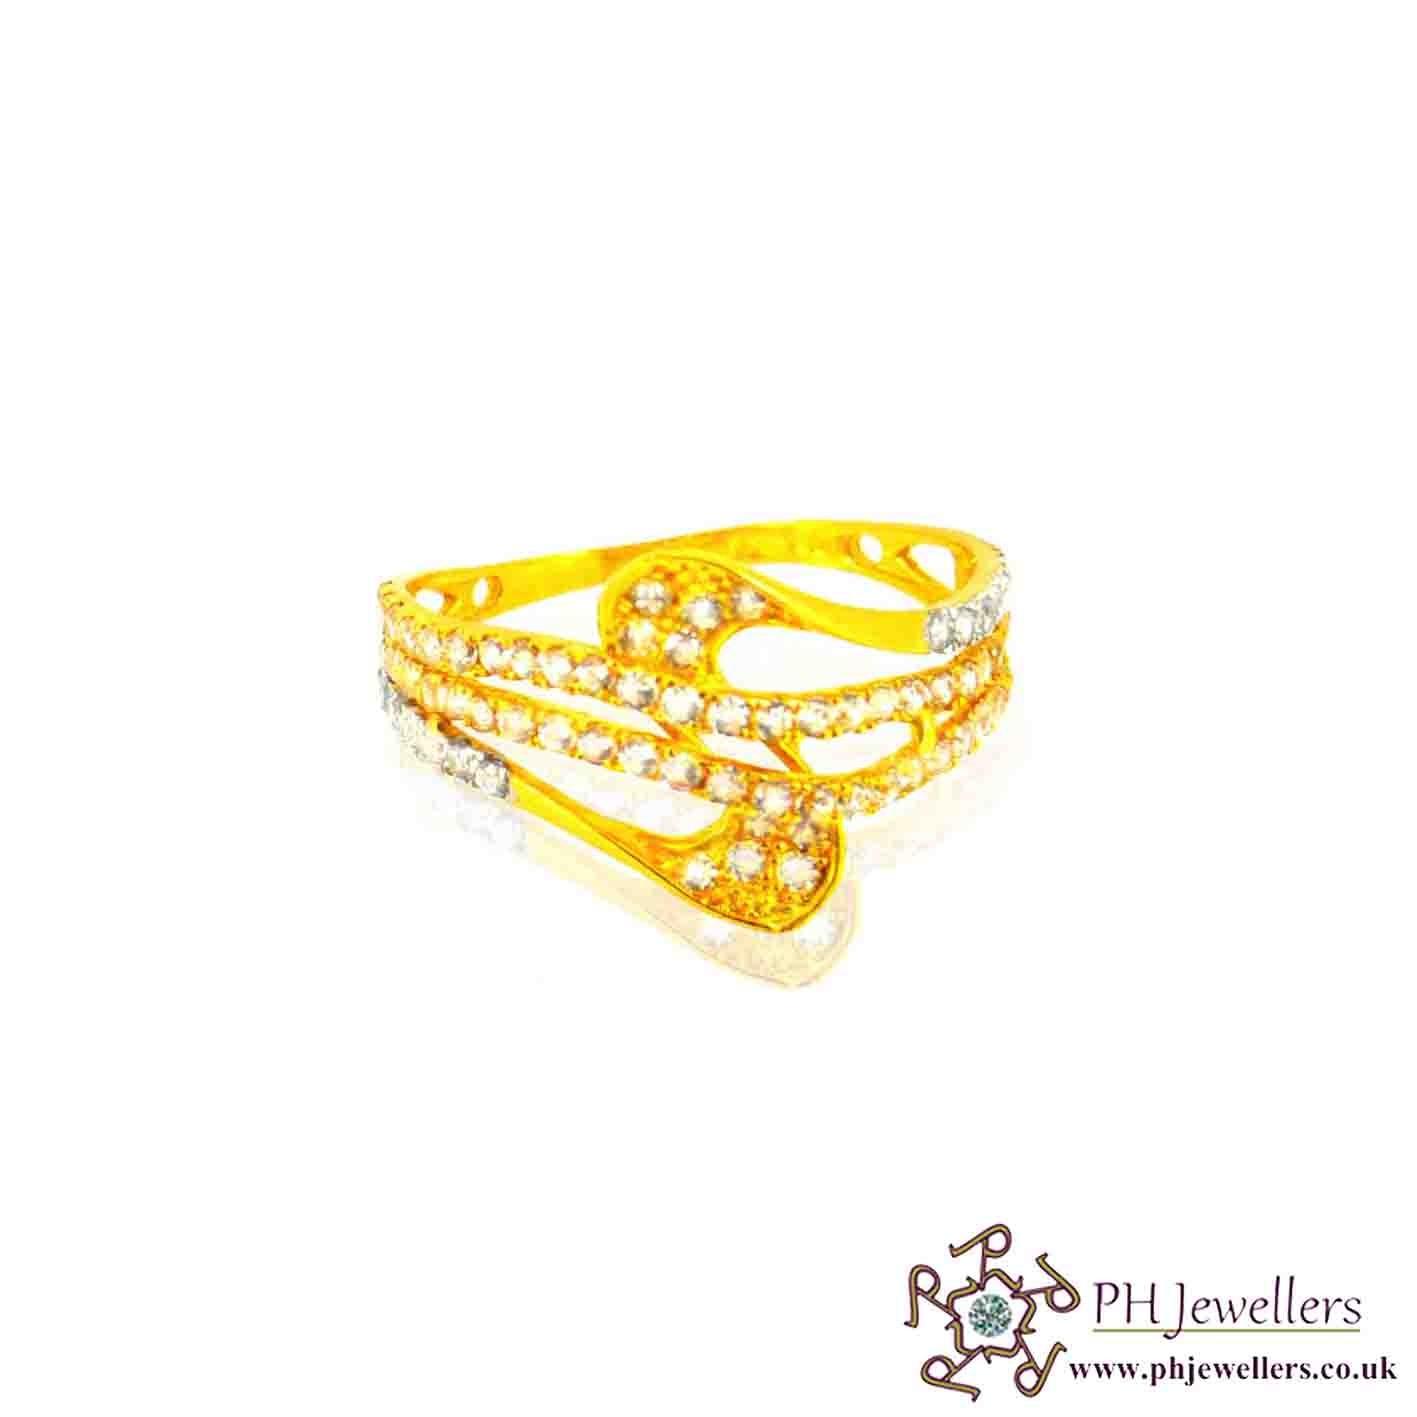 22ct 916 Hallmark Yellow Gold Rhodium Size P1/2 Ring CZ SR19